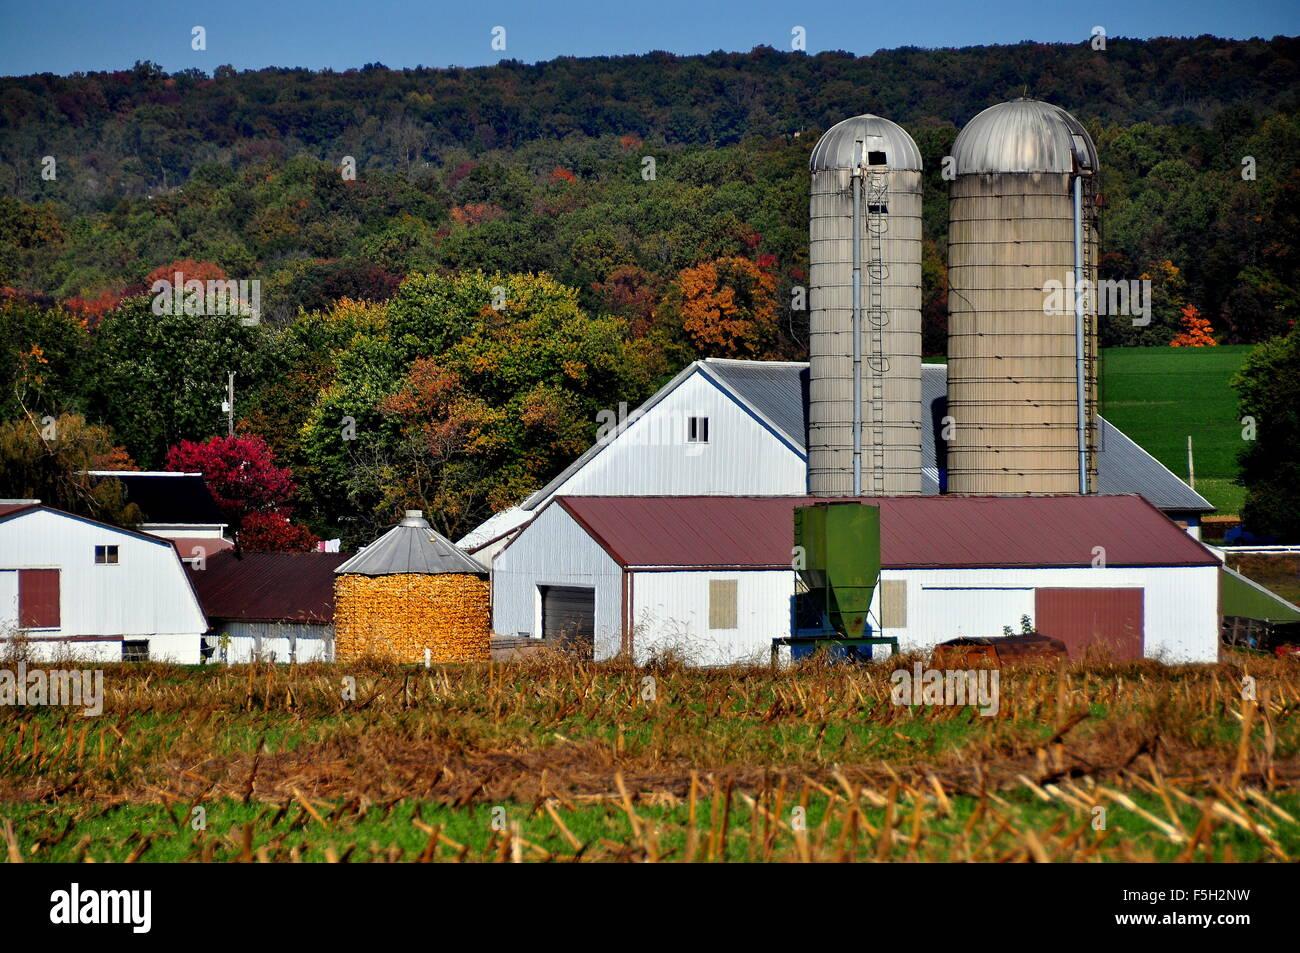 Amish crib for sale - Lancaster County Pennsylvania Pristine Amish Farm With Silos Barns And A Filled Corn Crib